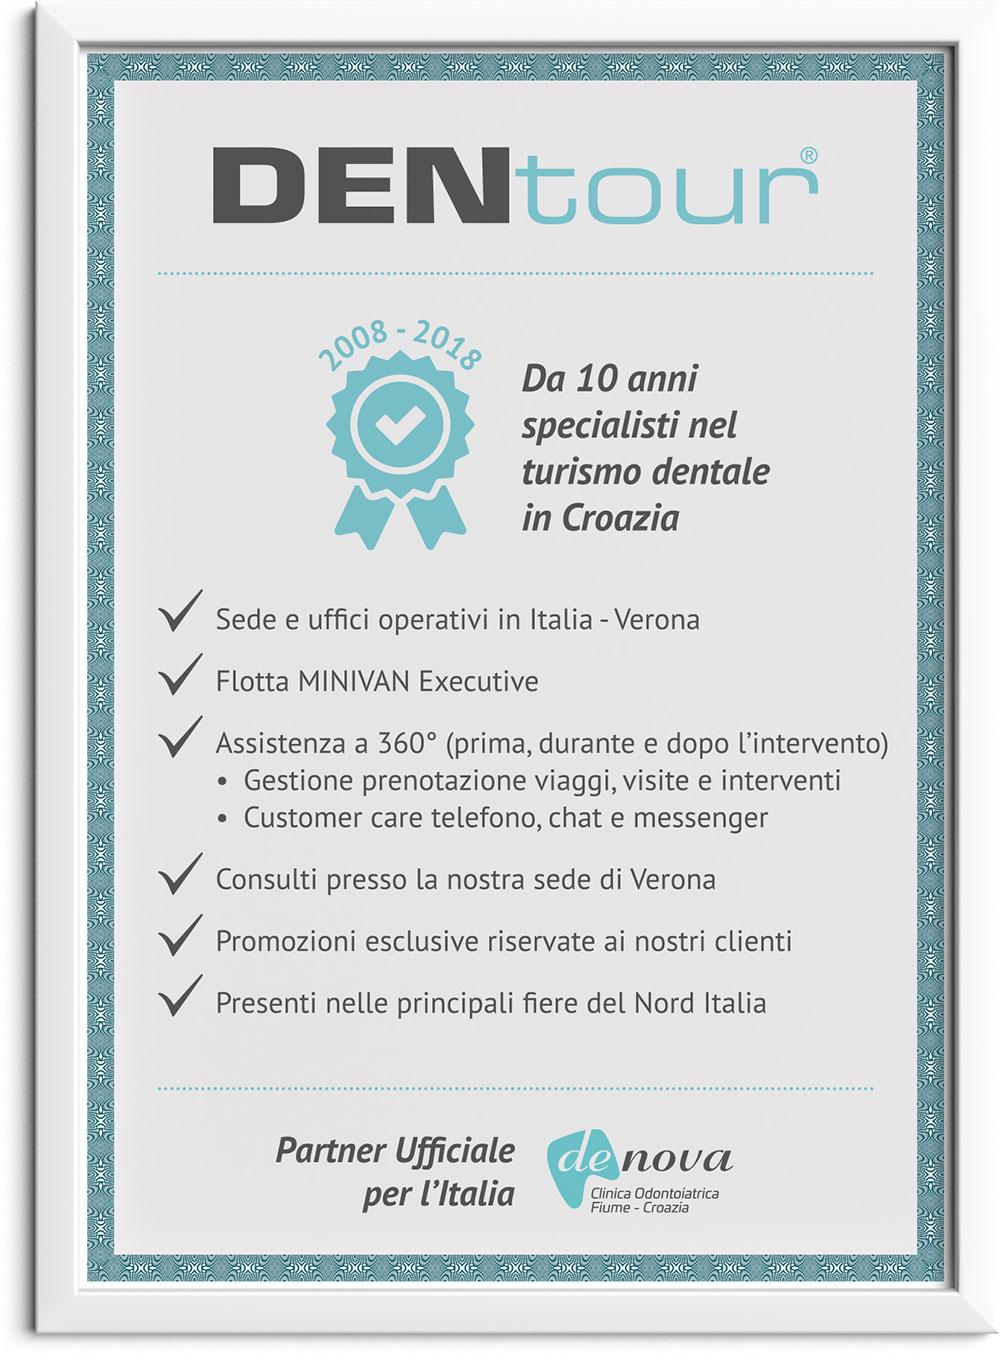 Certificazione Dentour